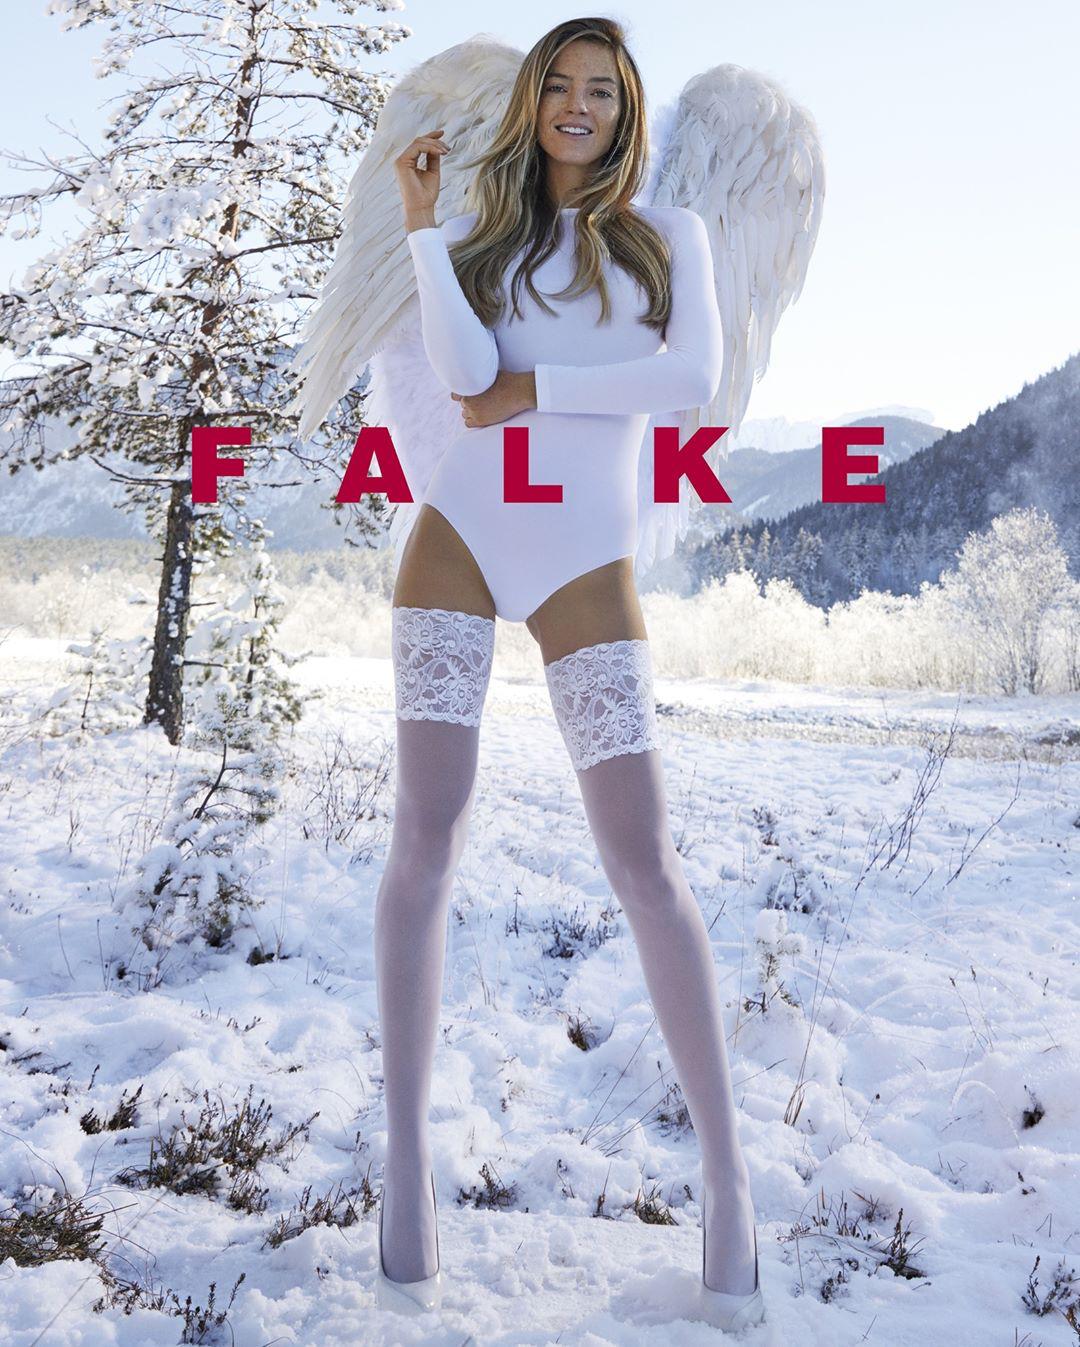 Falke_Speedball_Productions.jpg